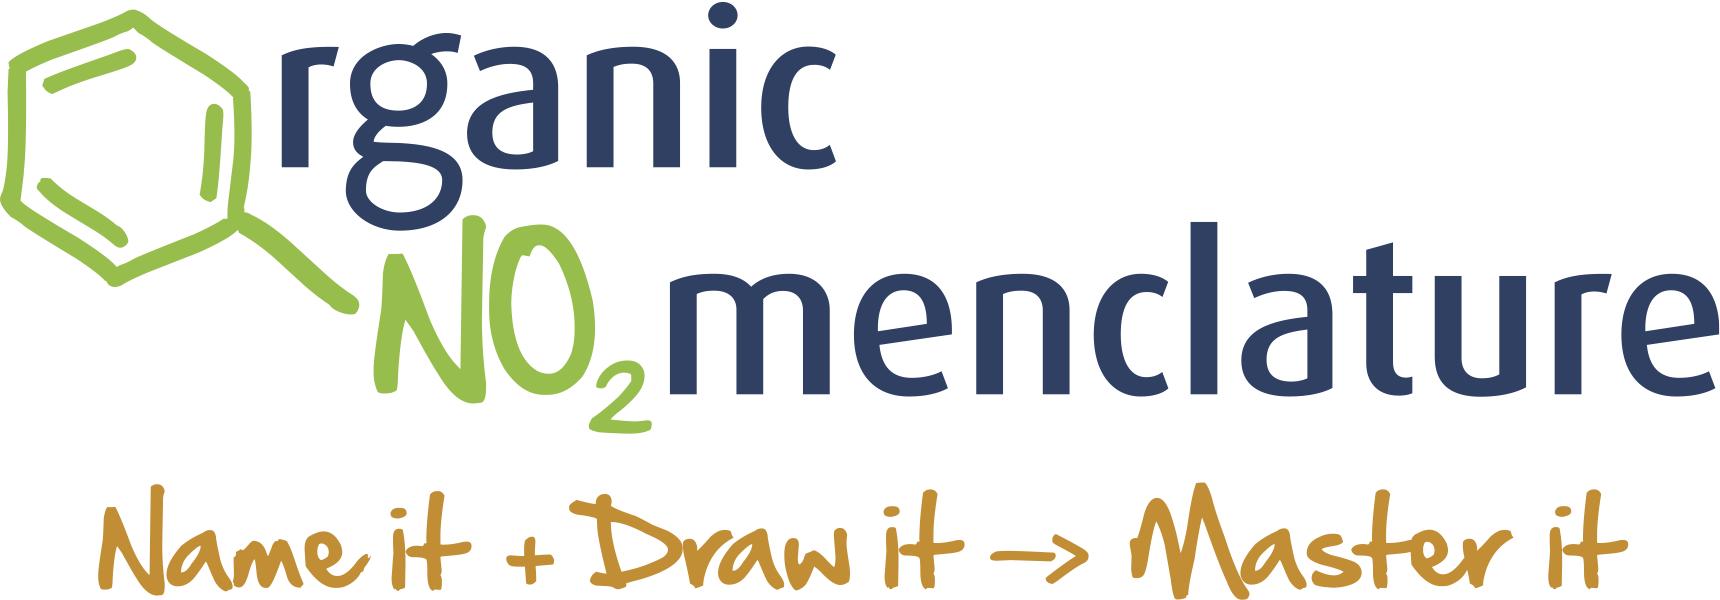 Nomenclature_logo_EN.png